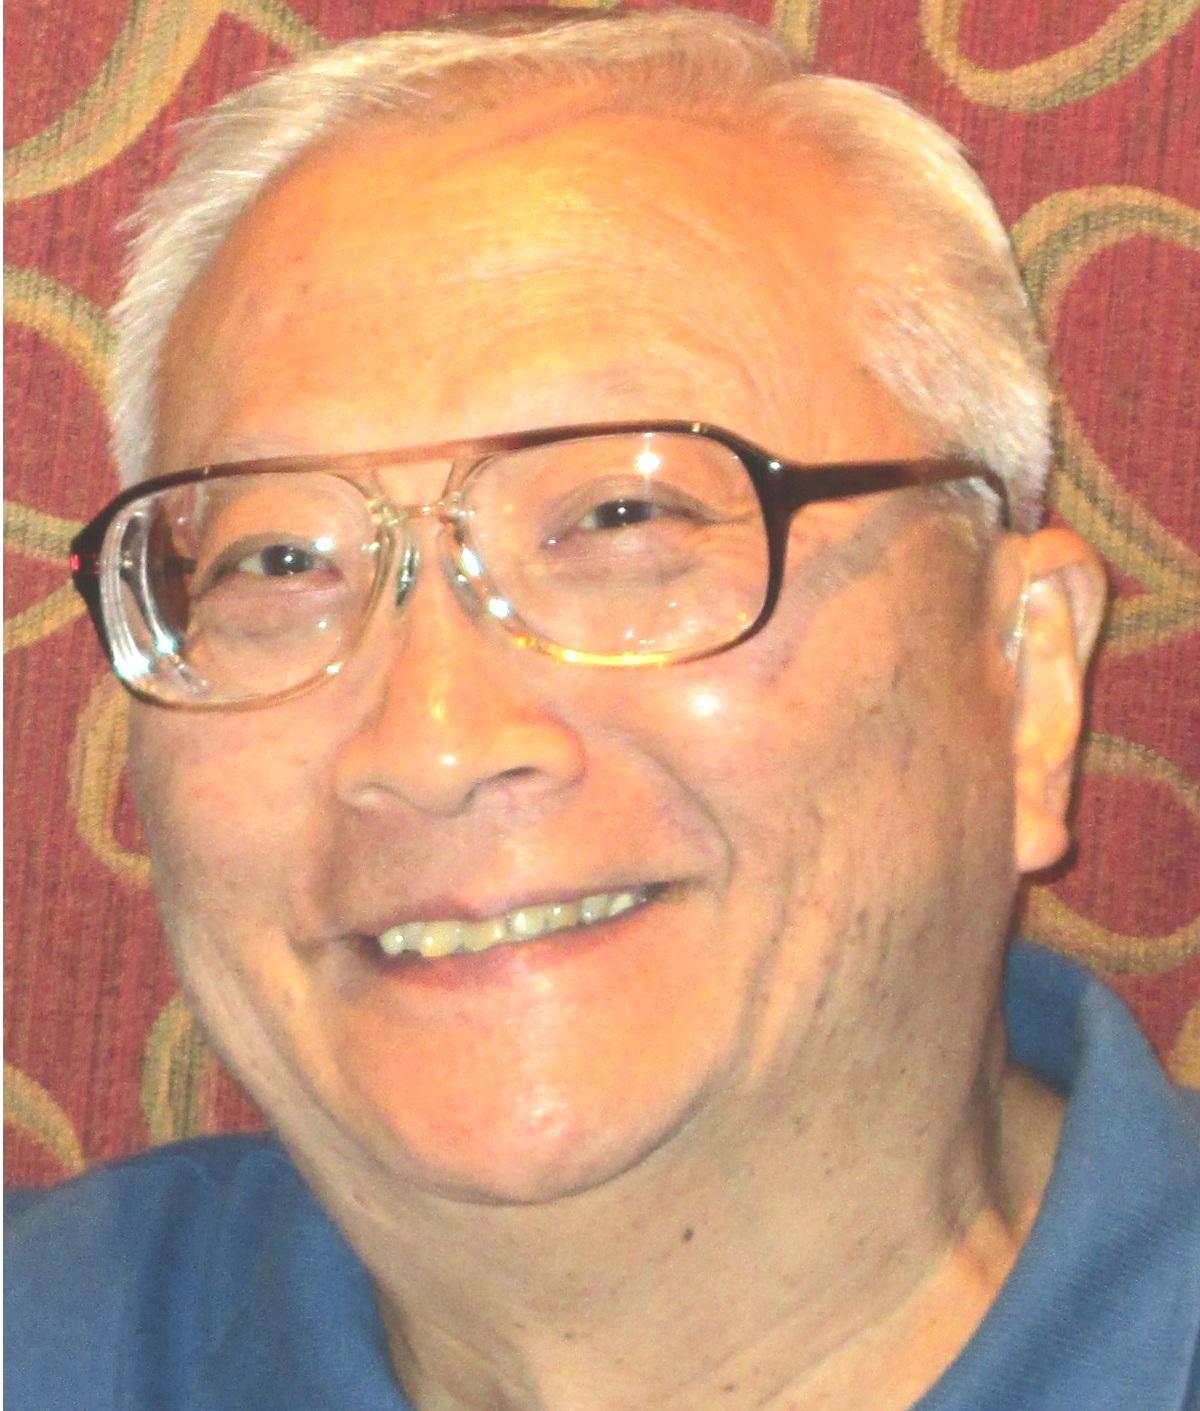 Constantine Ying Ngai Lum